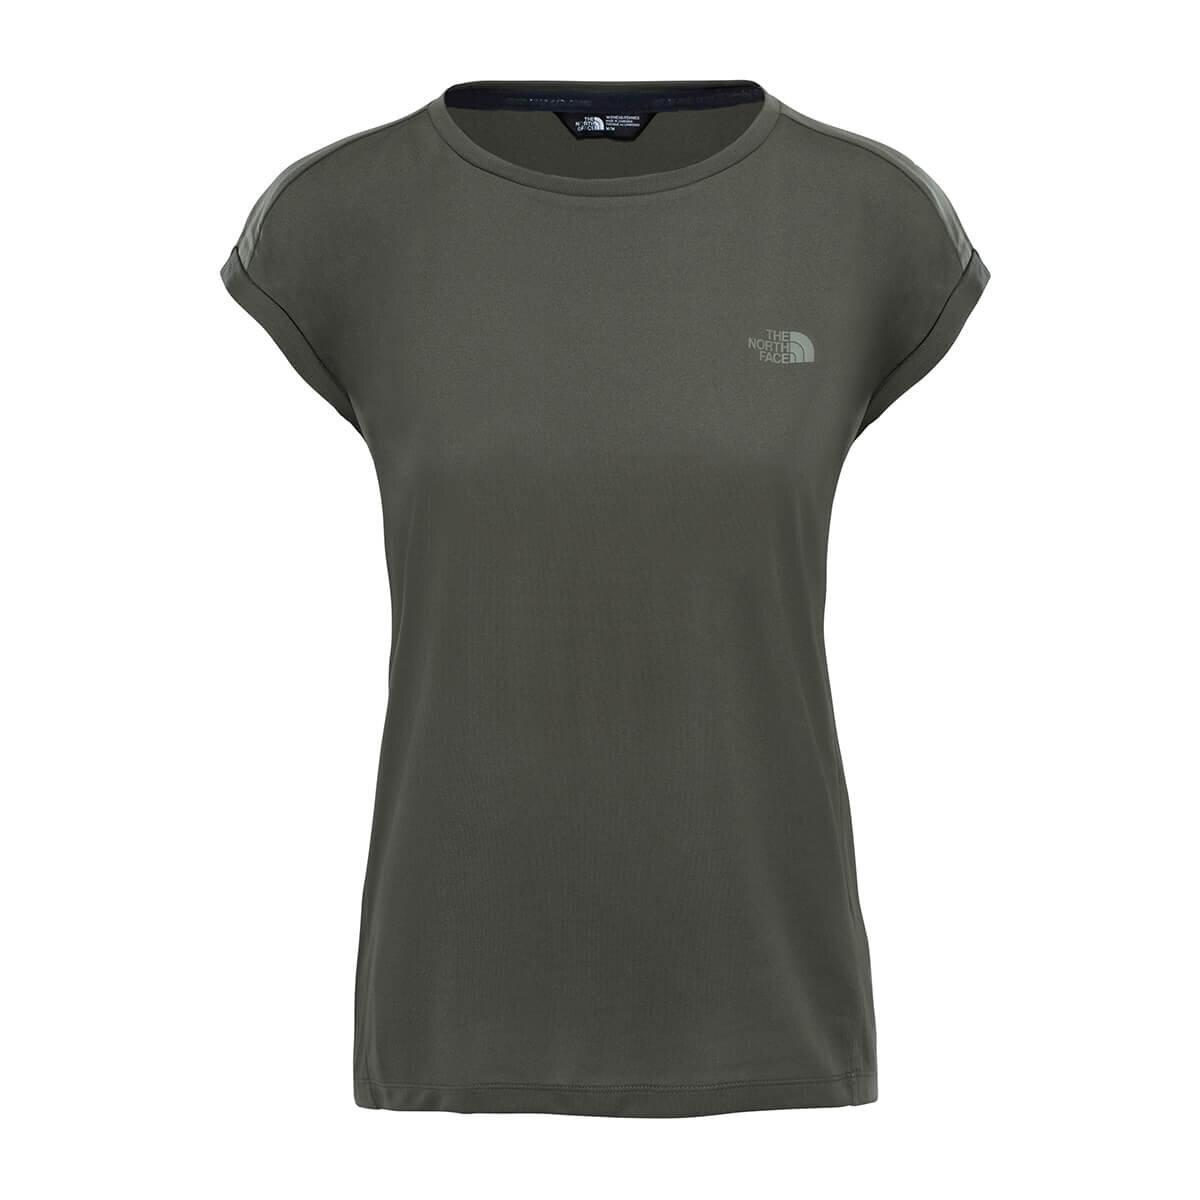 THE NORTH FACE Yeşil Kadın Kısa Kol T-Shirt T92S7FHCJ